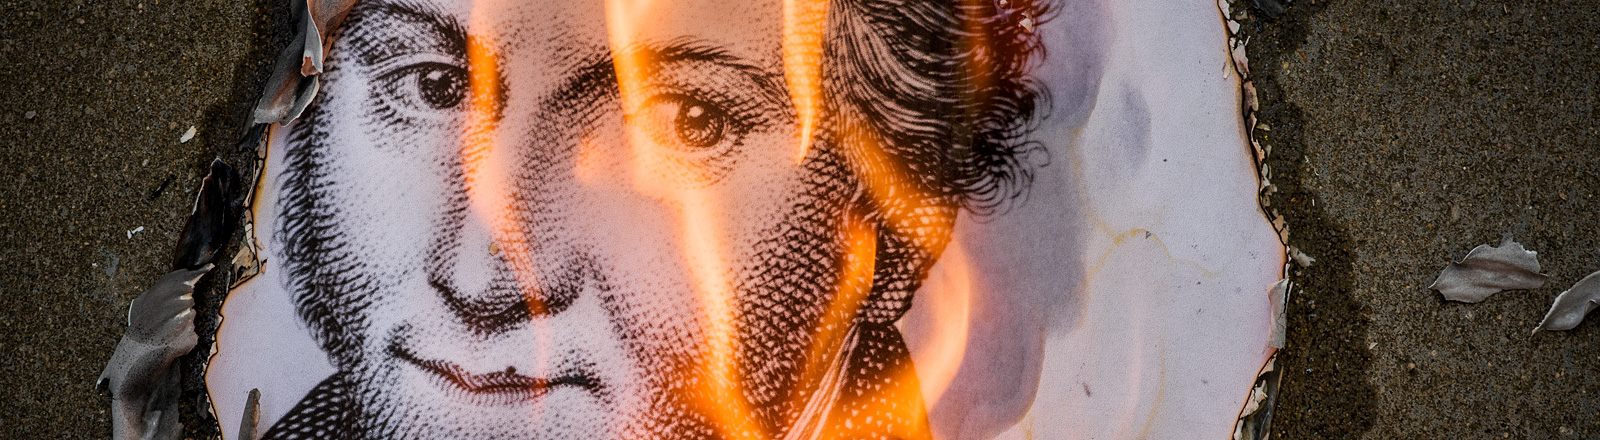 Ein Konterfei E.T.A. Hoffmanns brennt.